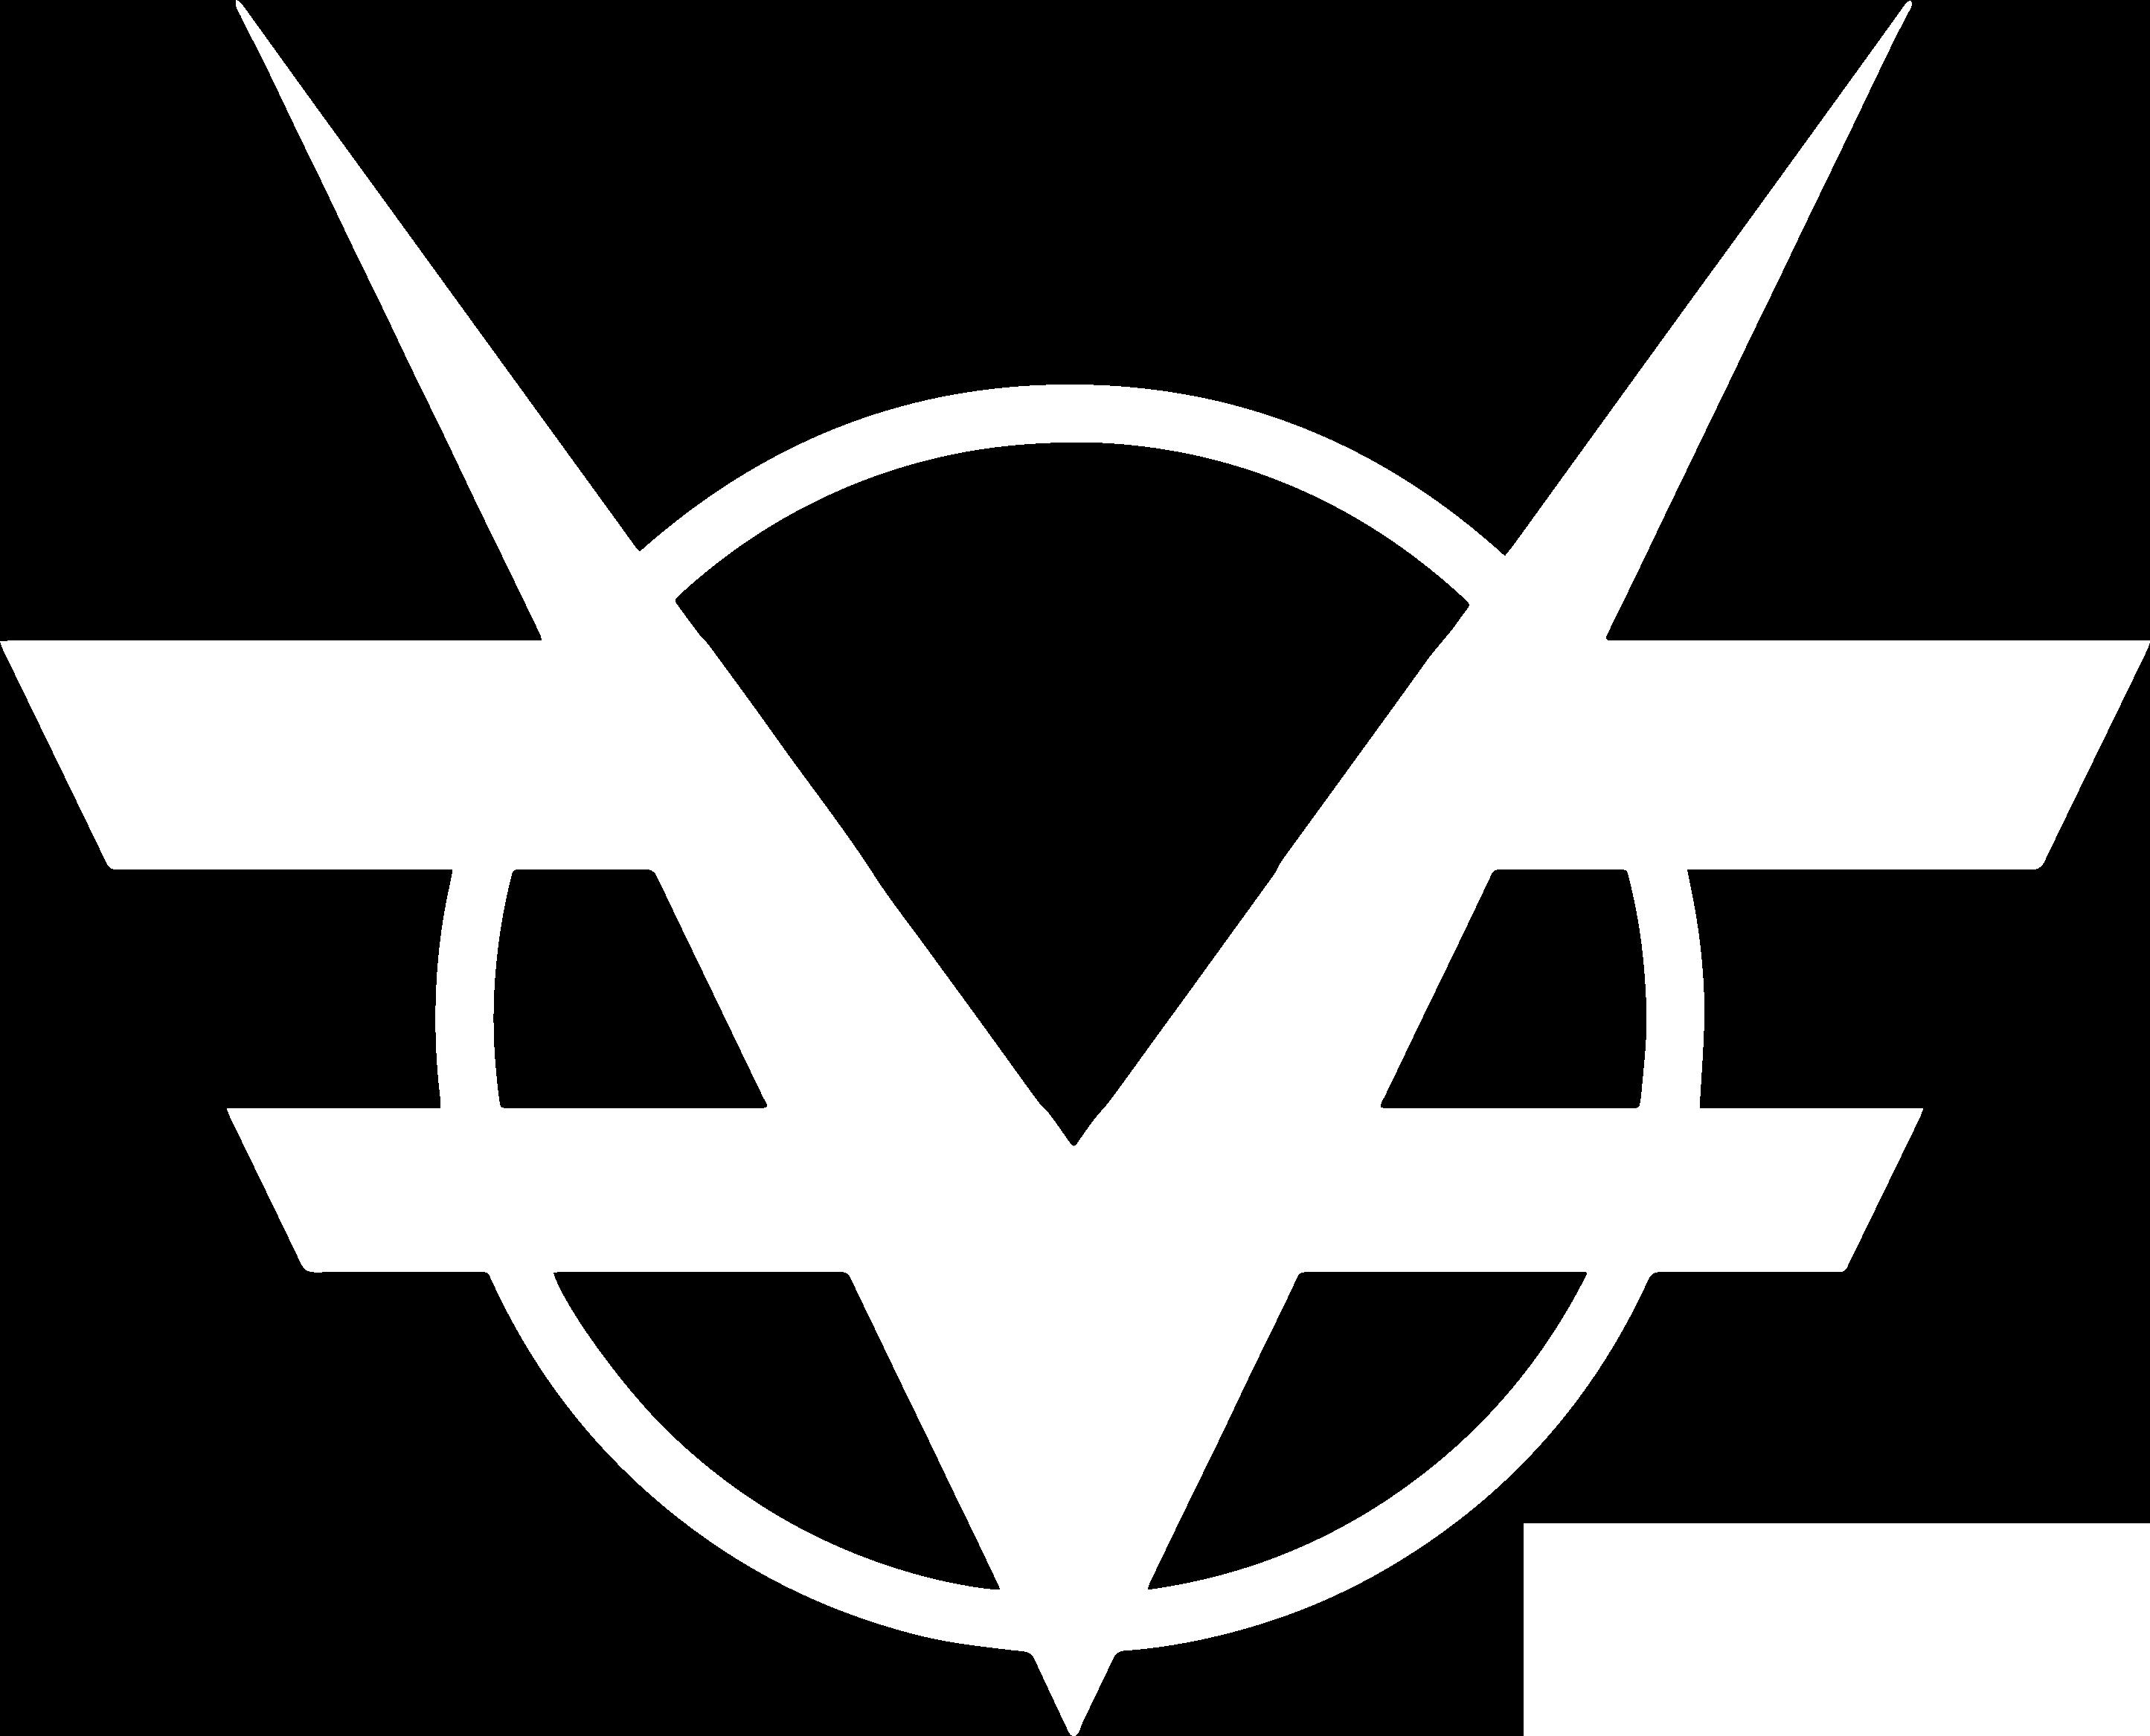 verglencia logo